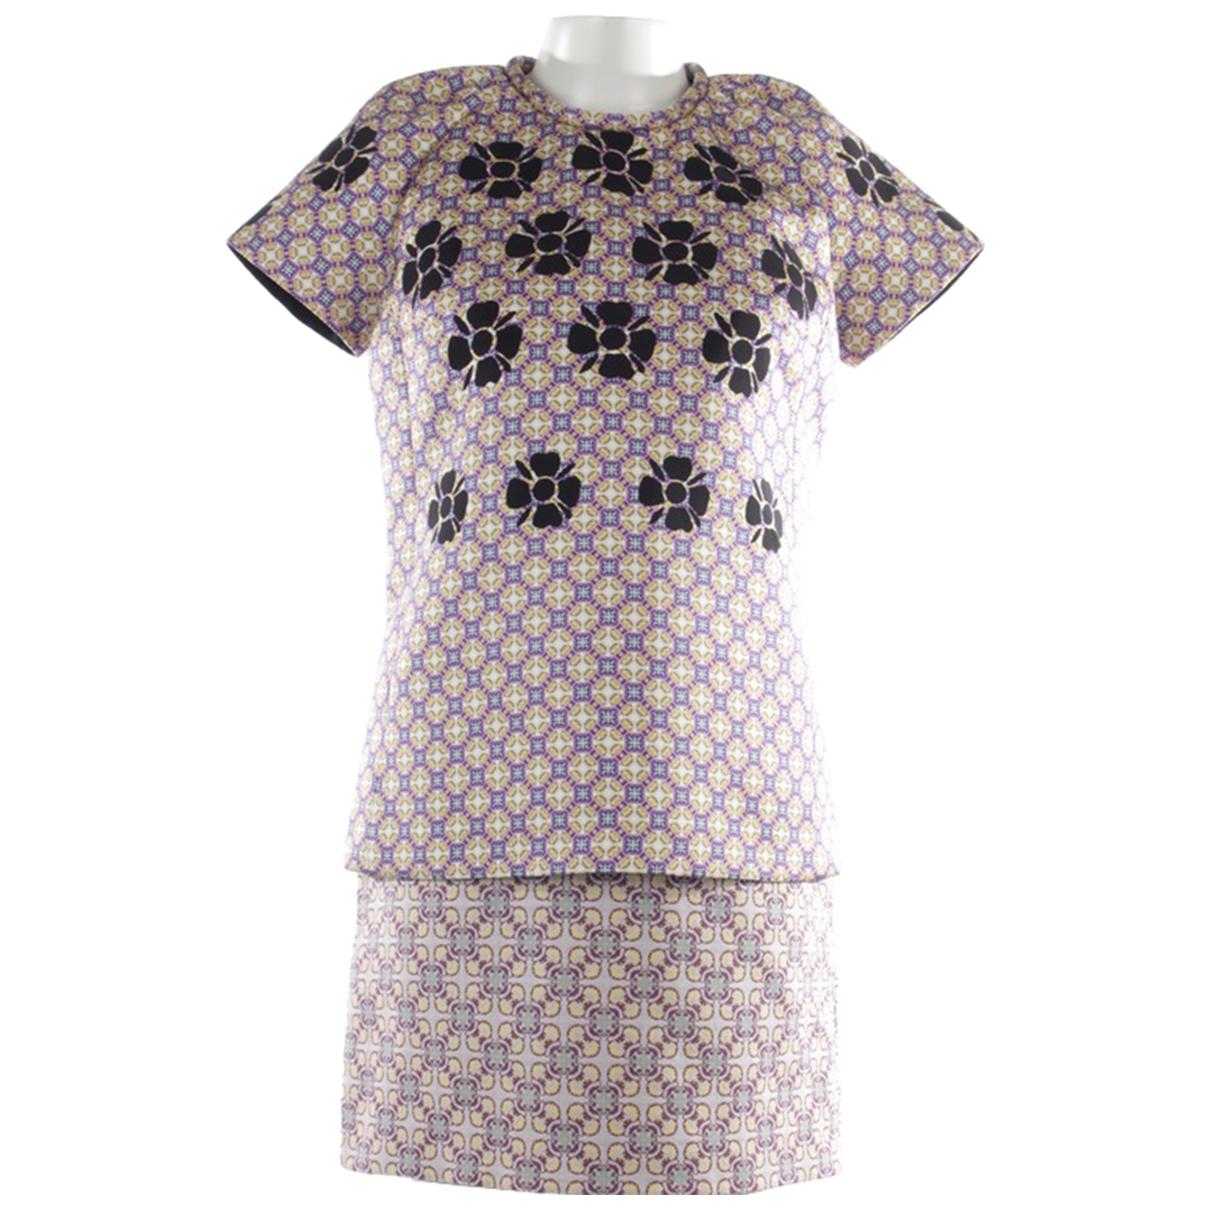 Victoria Beckham \N Kleid in  Bunt Synthetik